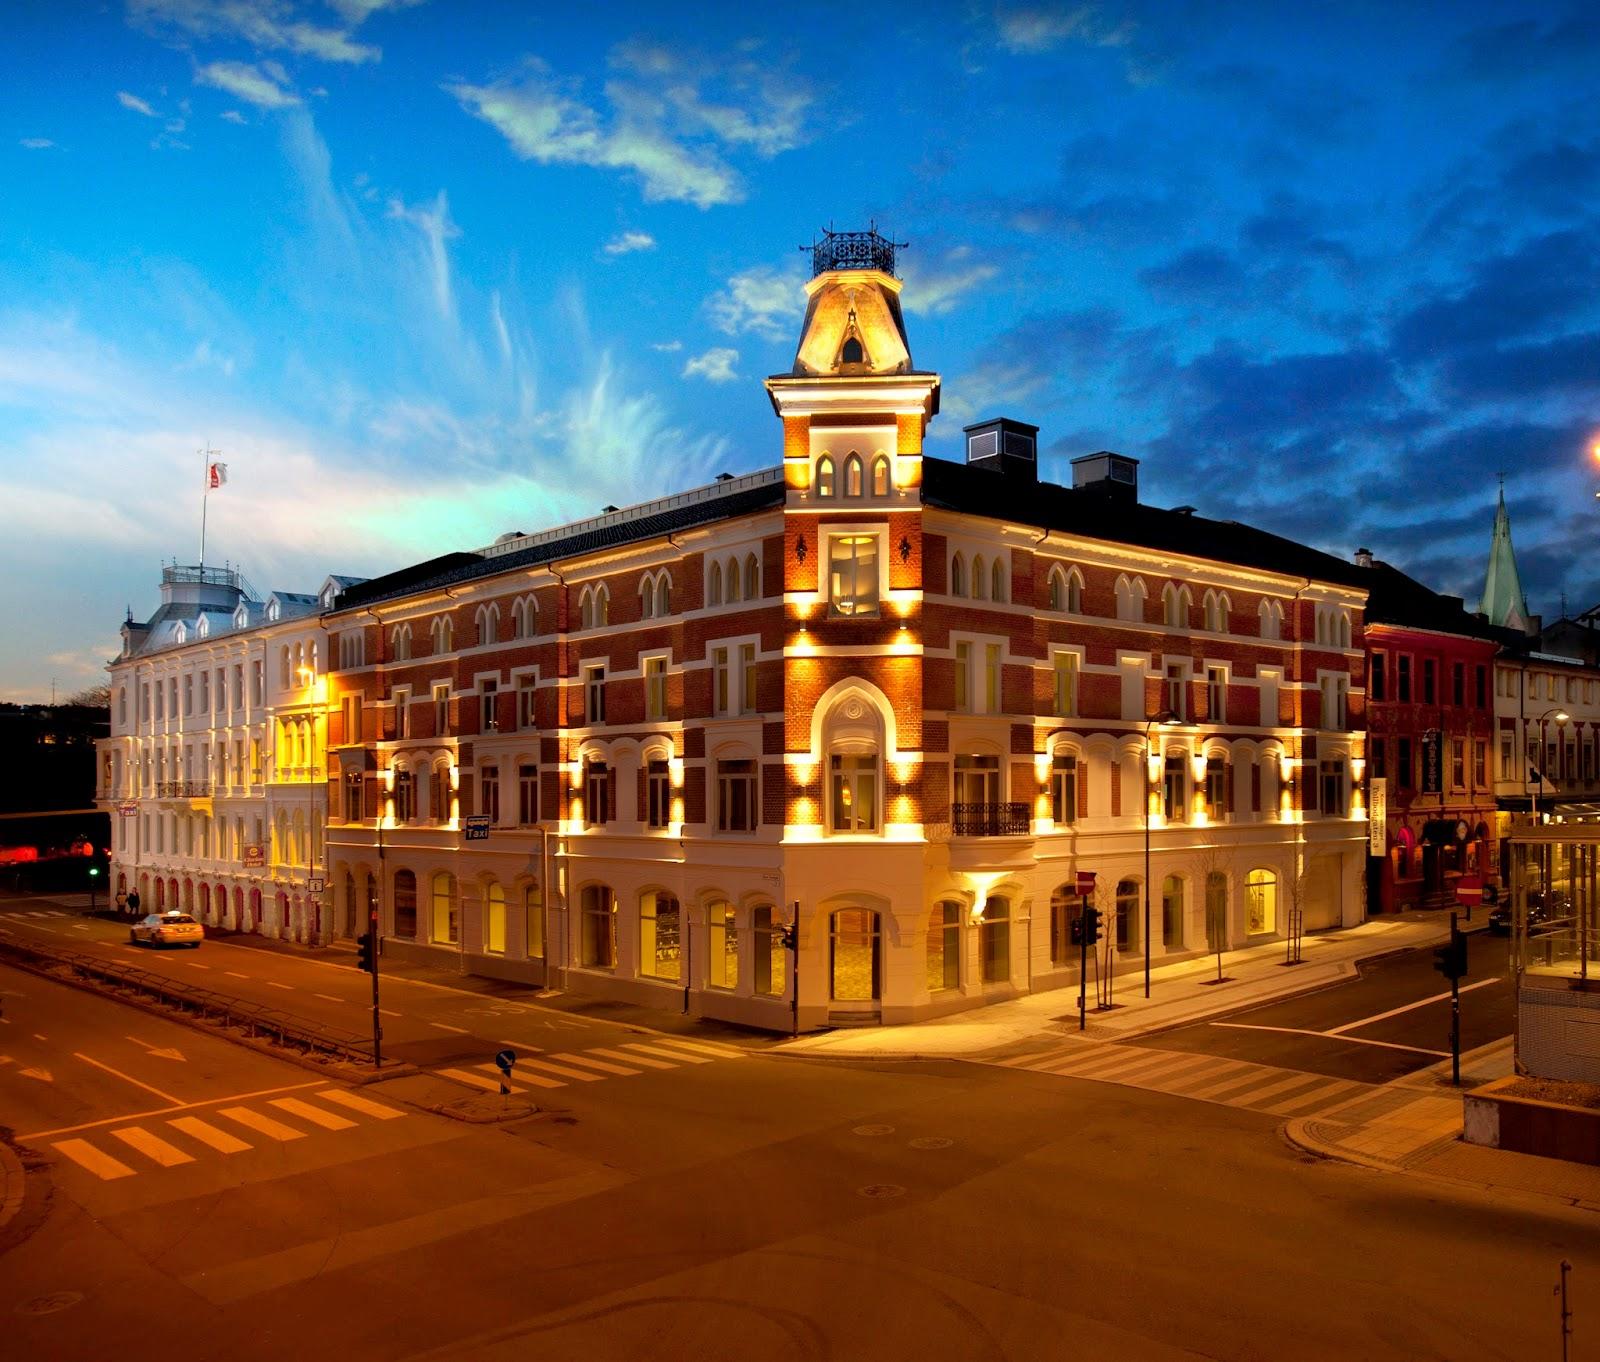 Clarion Hotel Ernst med sitt flotte lys i skumringen